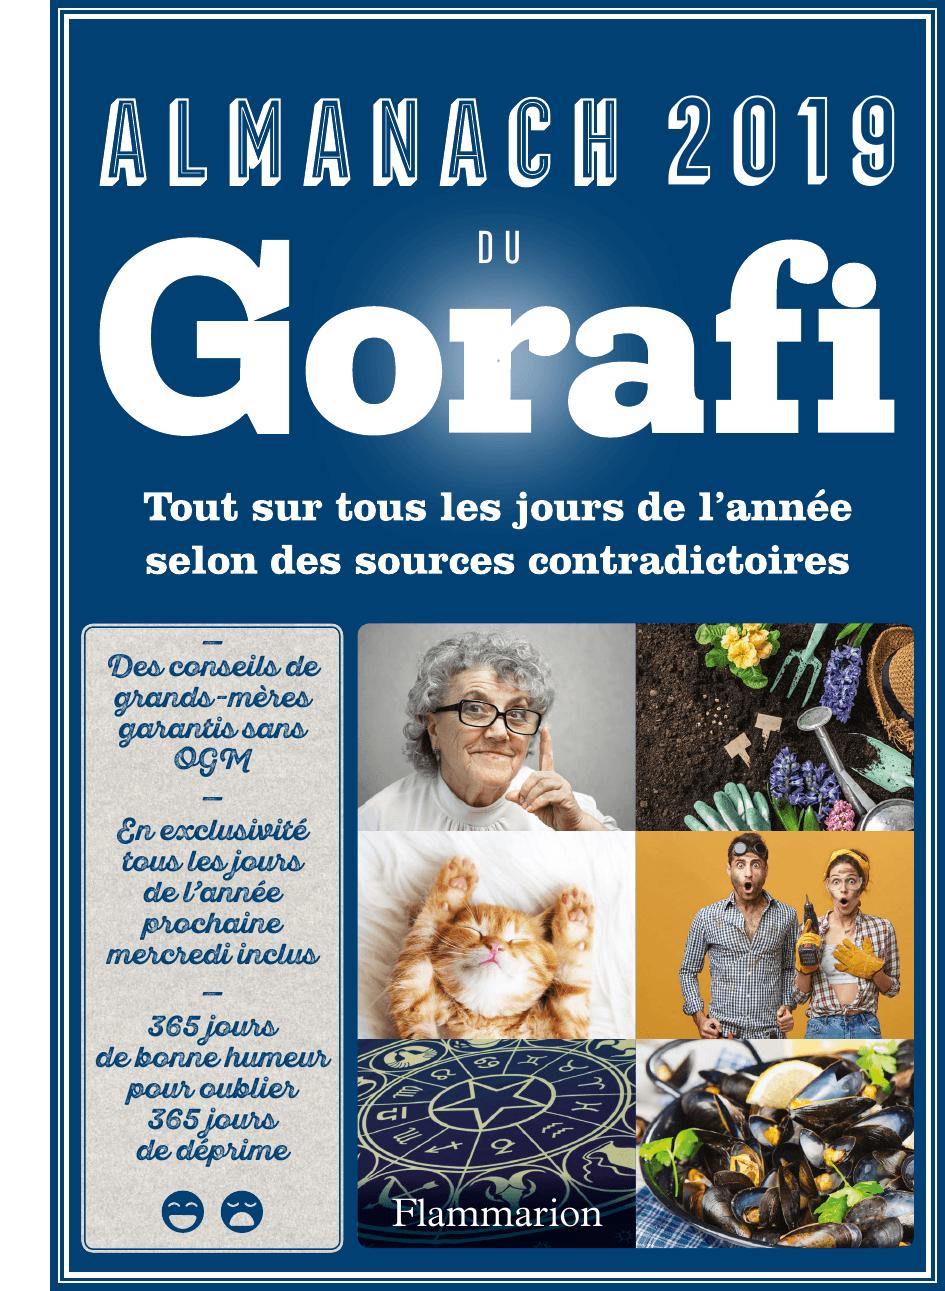 Almanach illustré du Gorafi